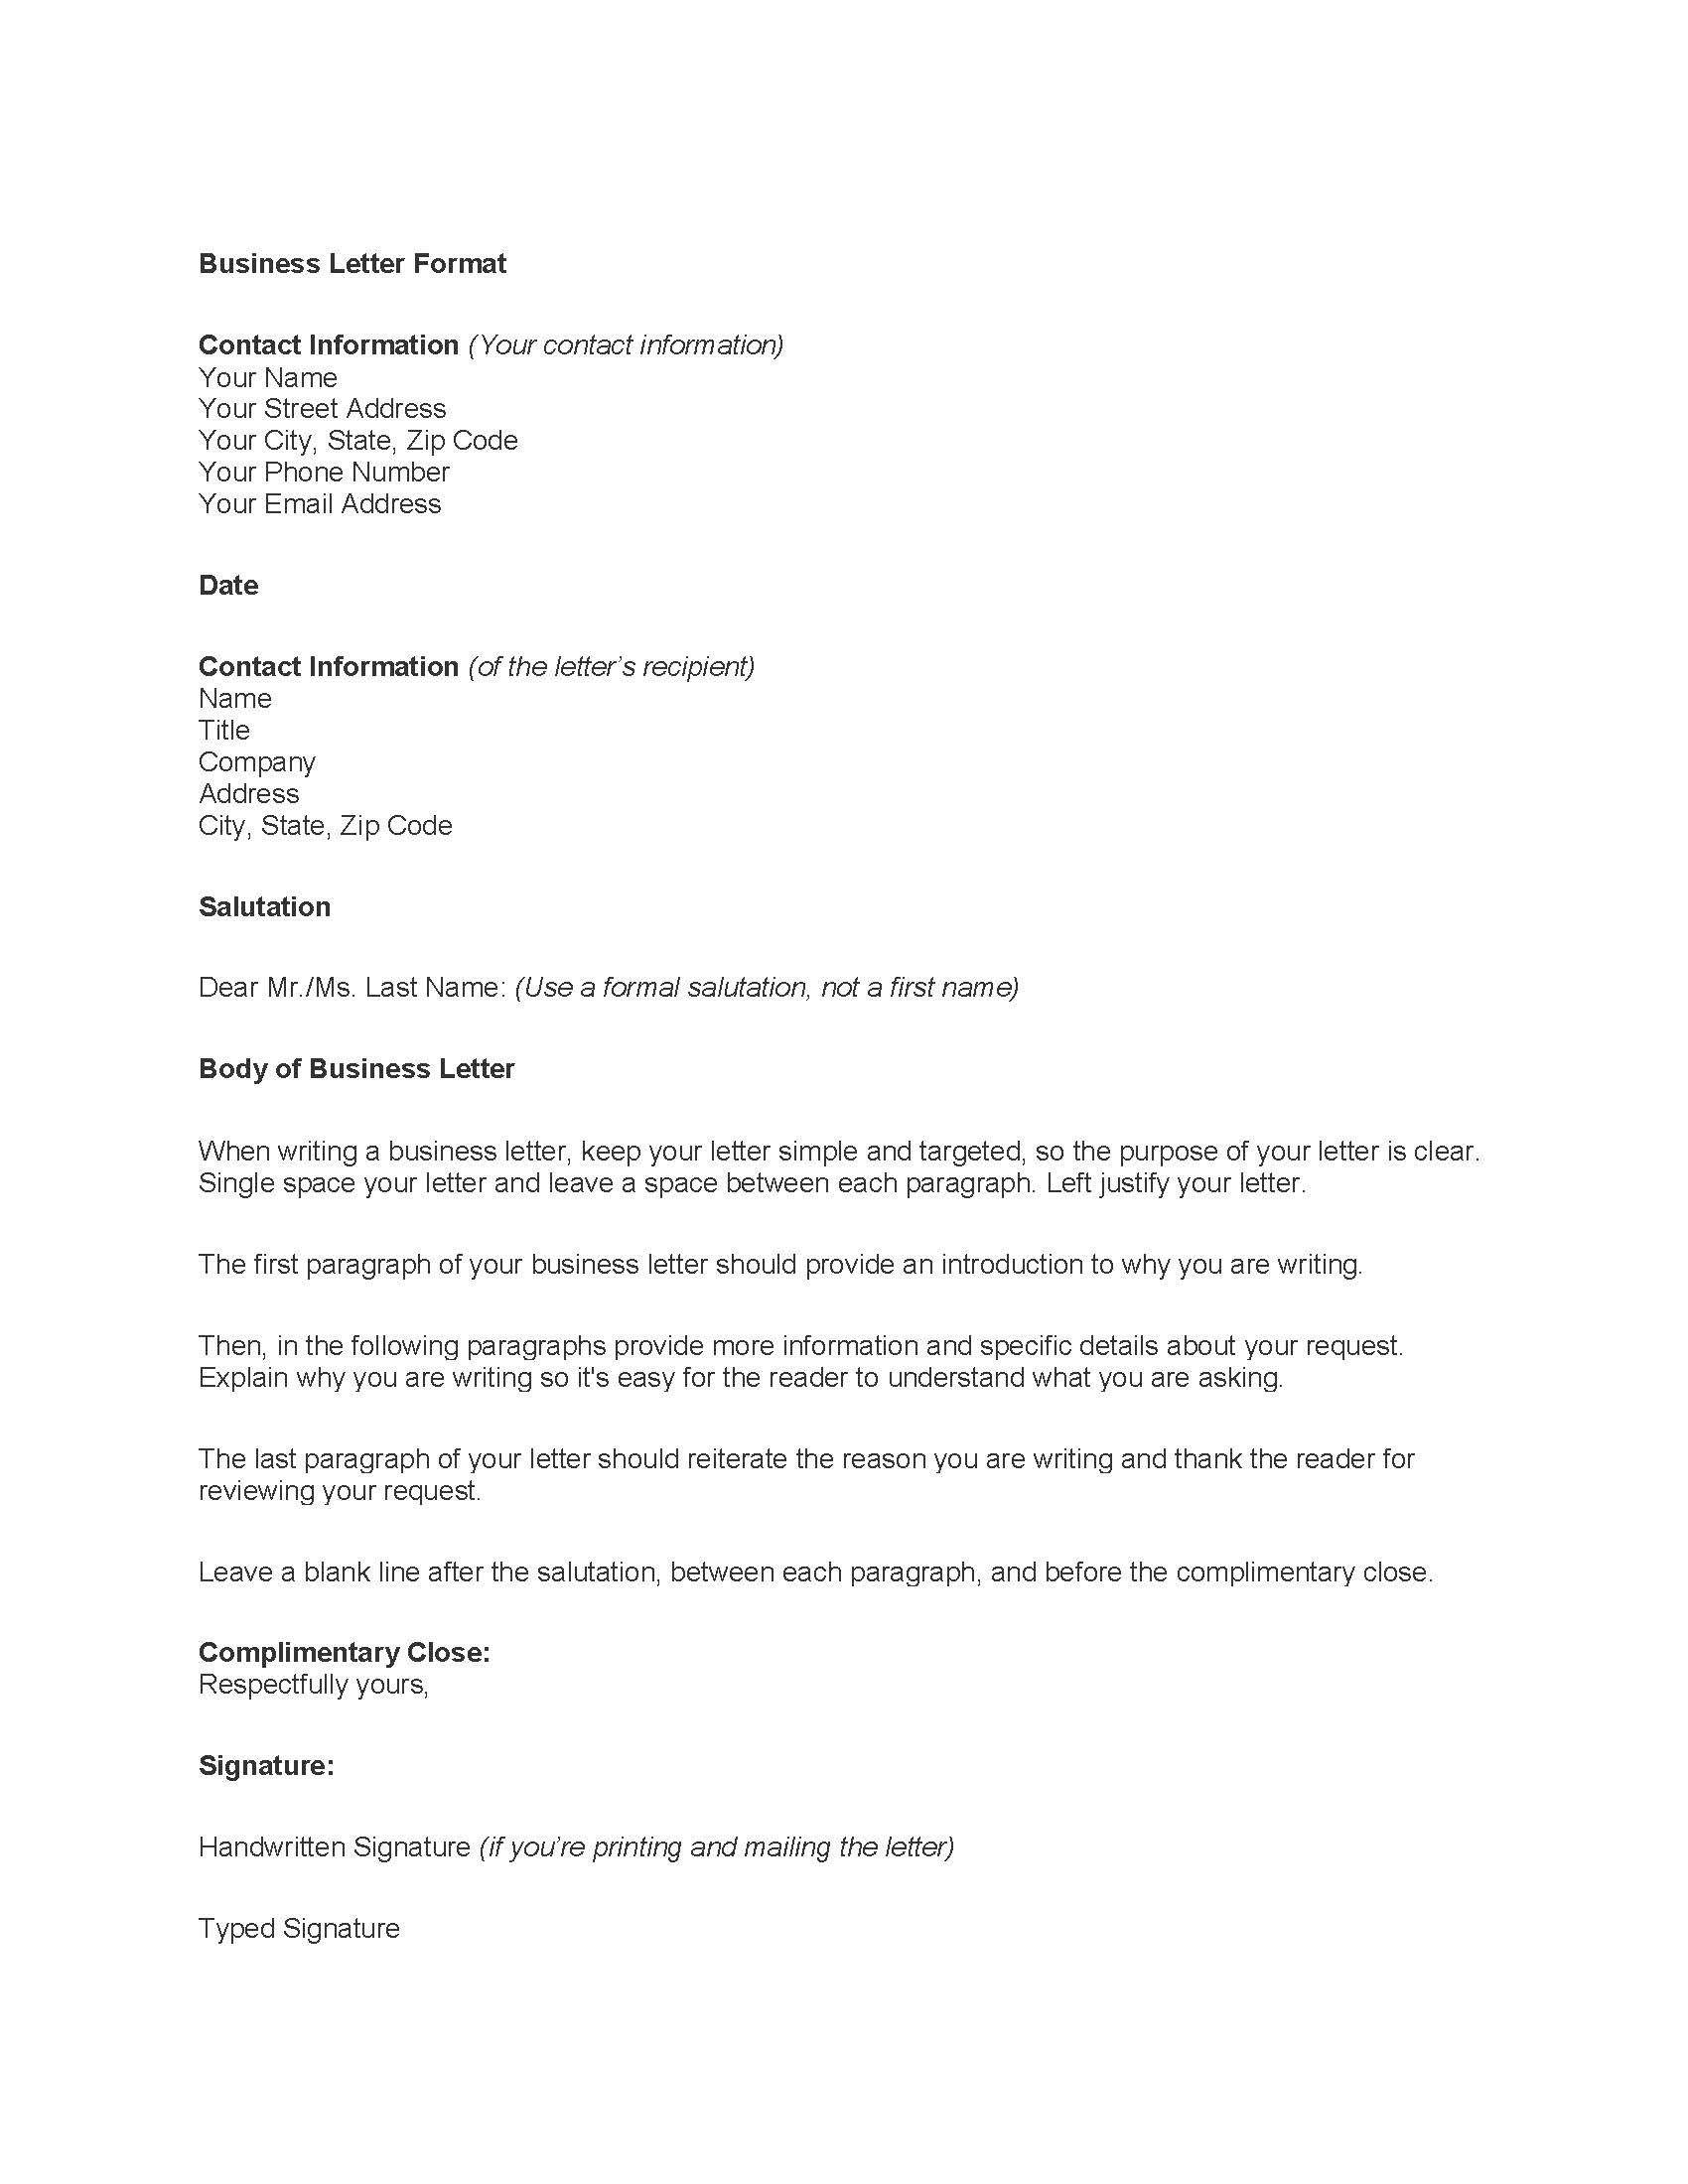 Free Printable Business Letterhead Templates Free Business Letter Template Format Sle Get  News To Go 3 .